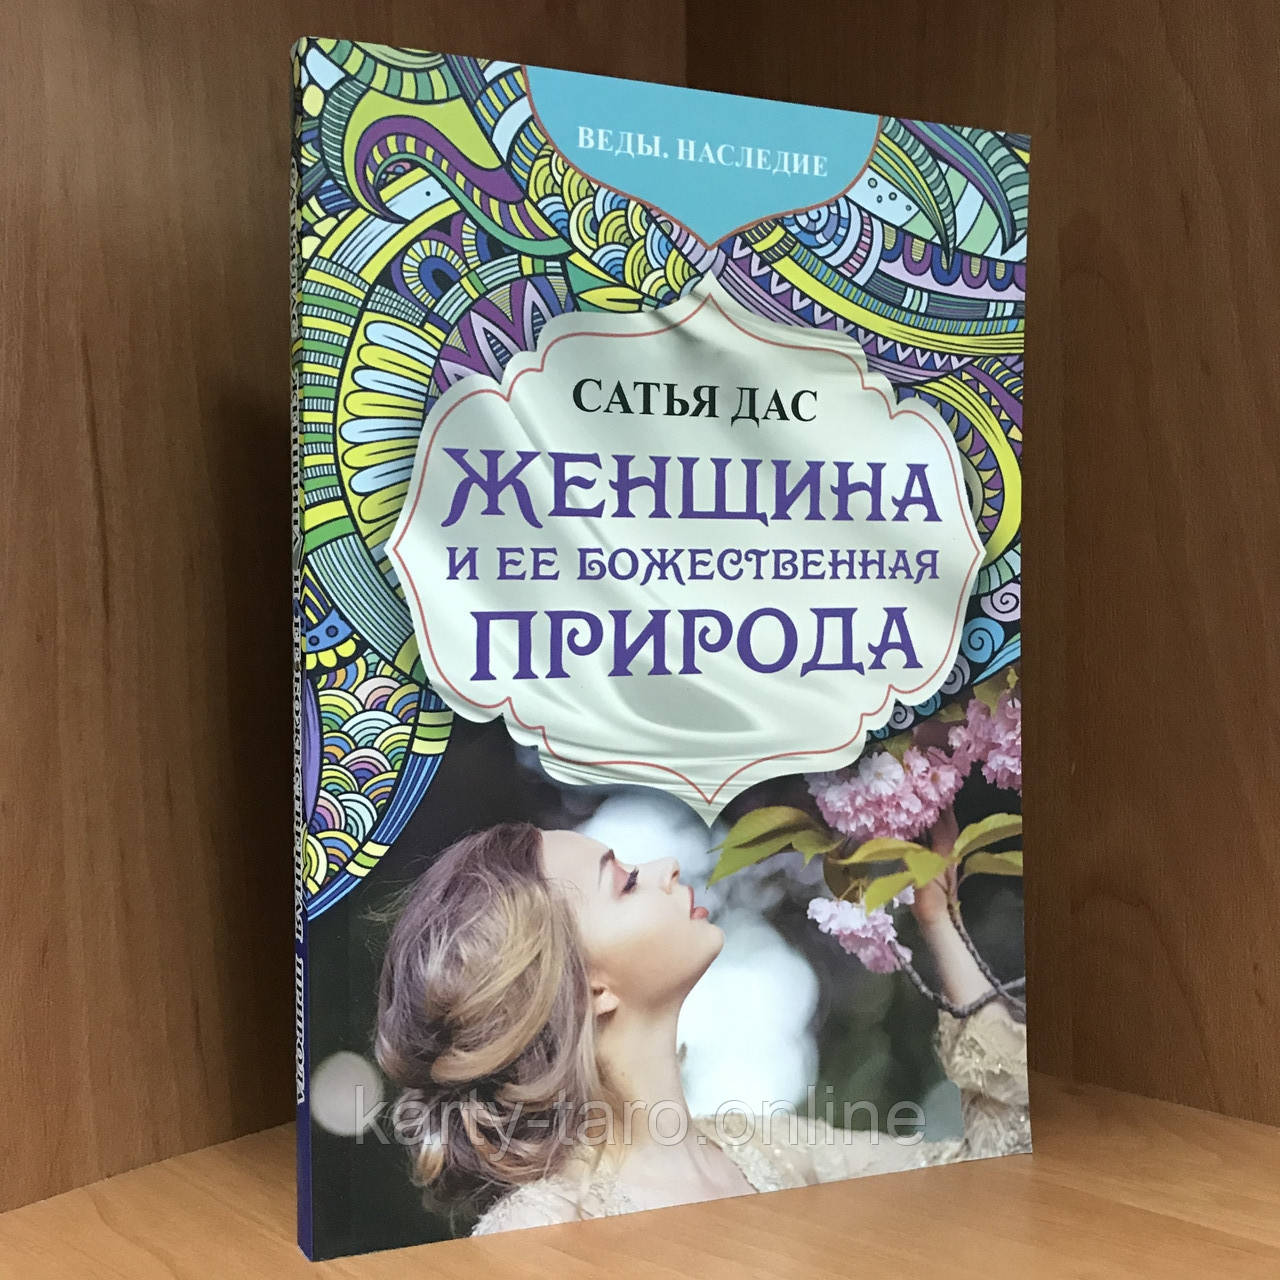 Книга Жінка і її божественна природа АСТ - Сатья Дас